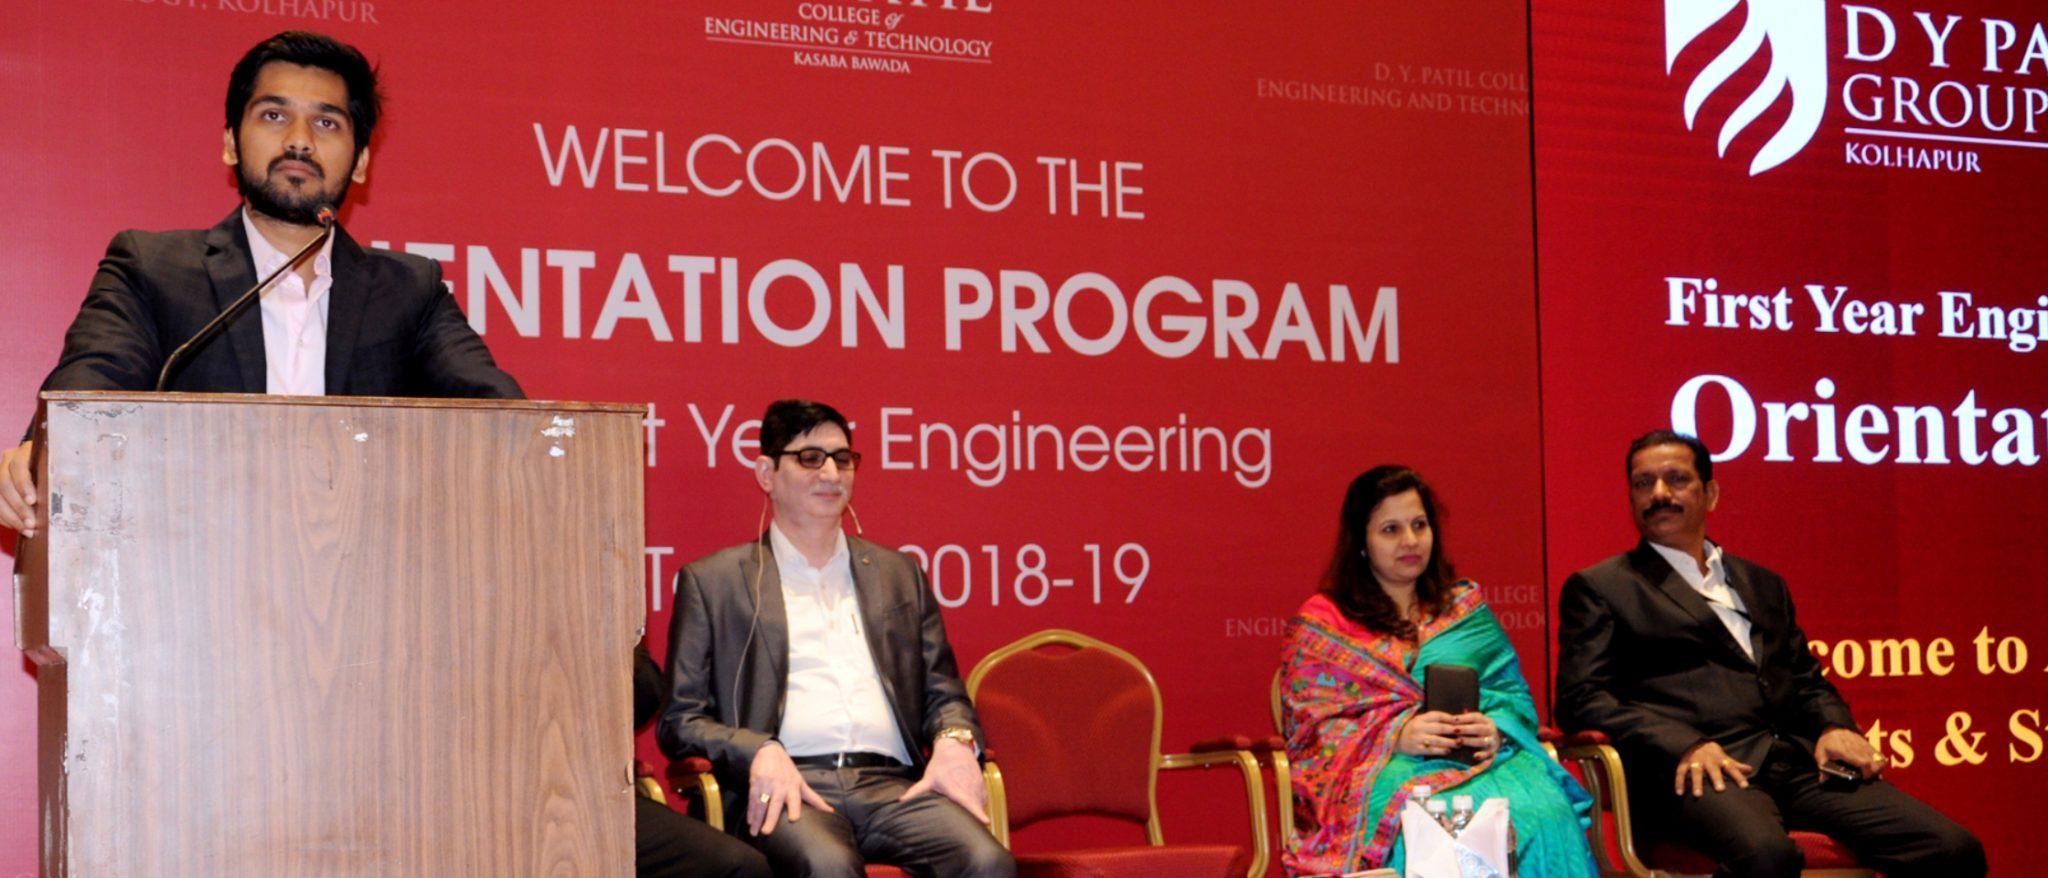 Orientation Program 2108-19_